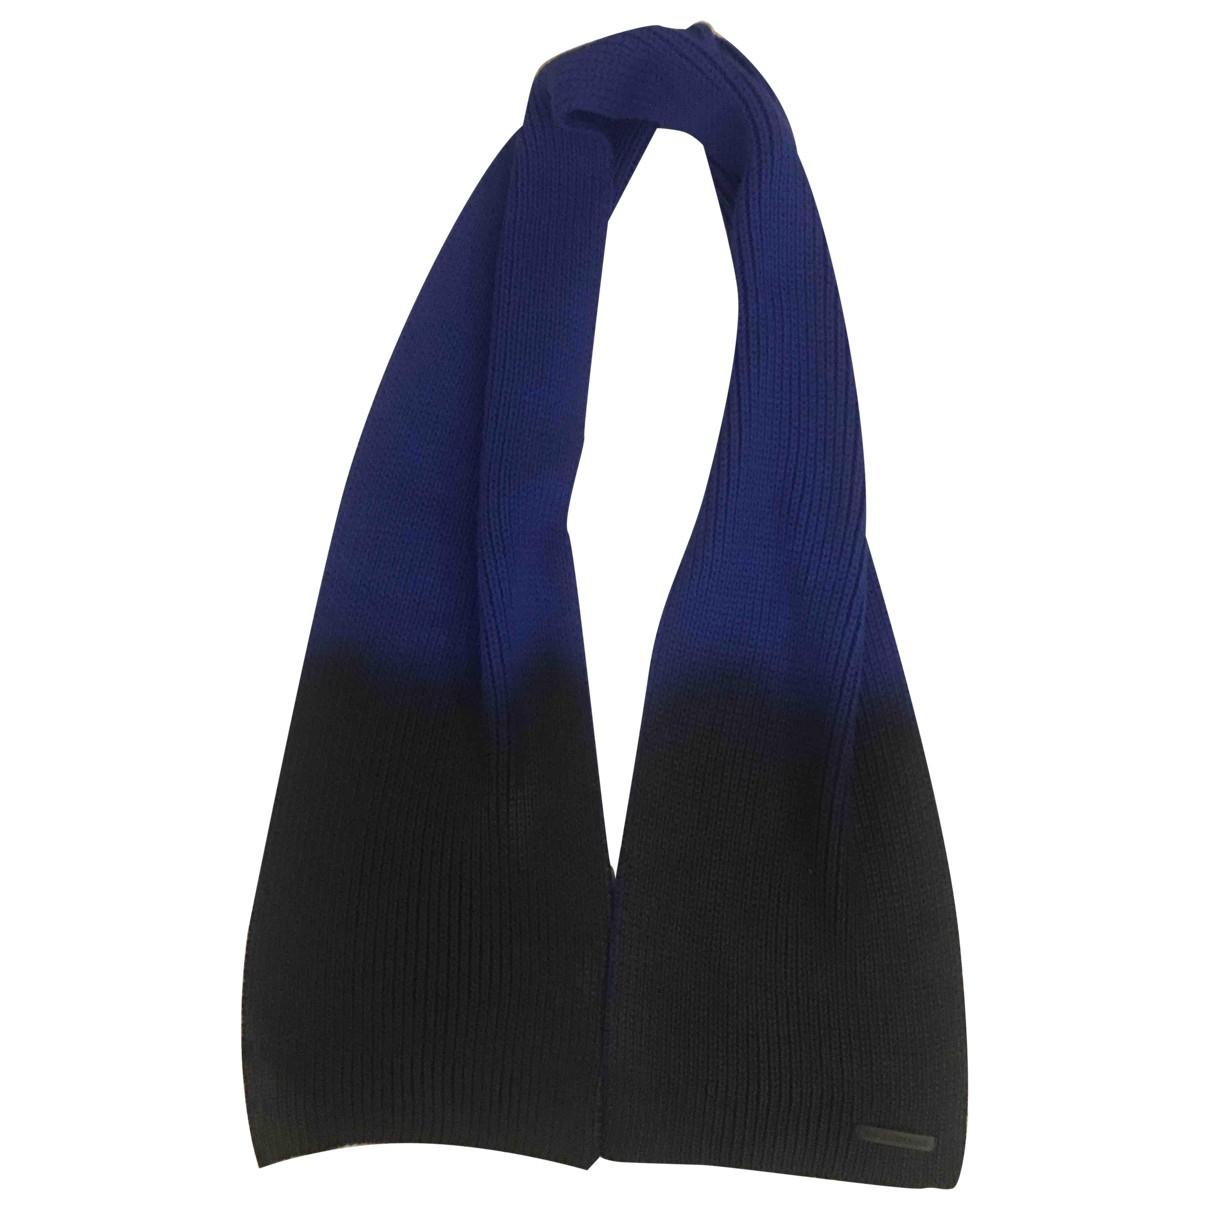 Emporio Armani - Cheches.Echarpes   pour homme en laine - bleu